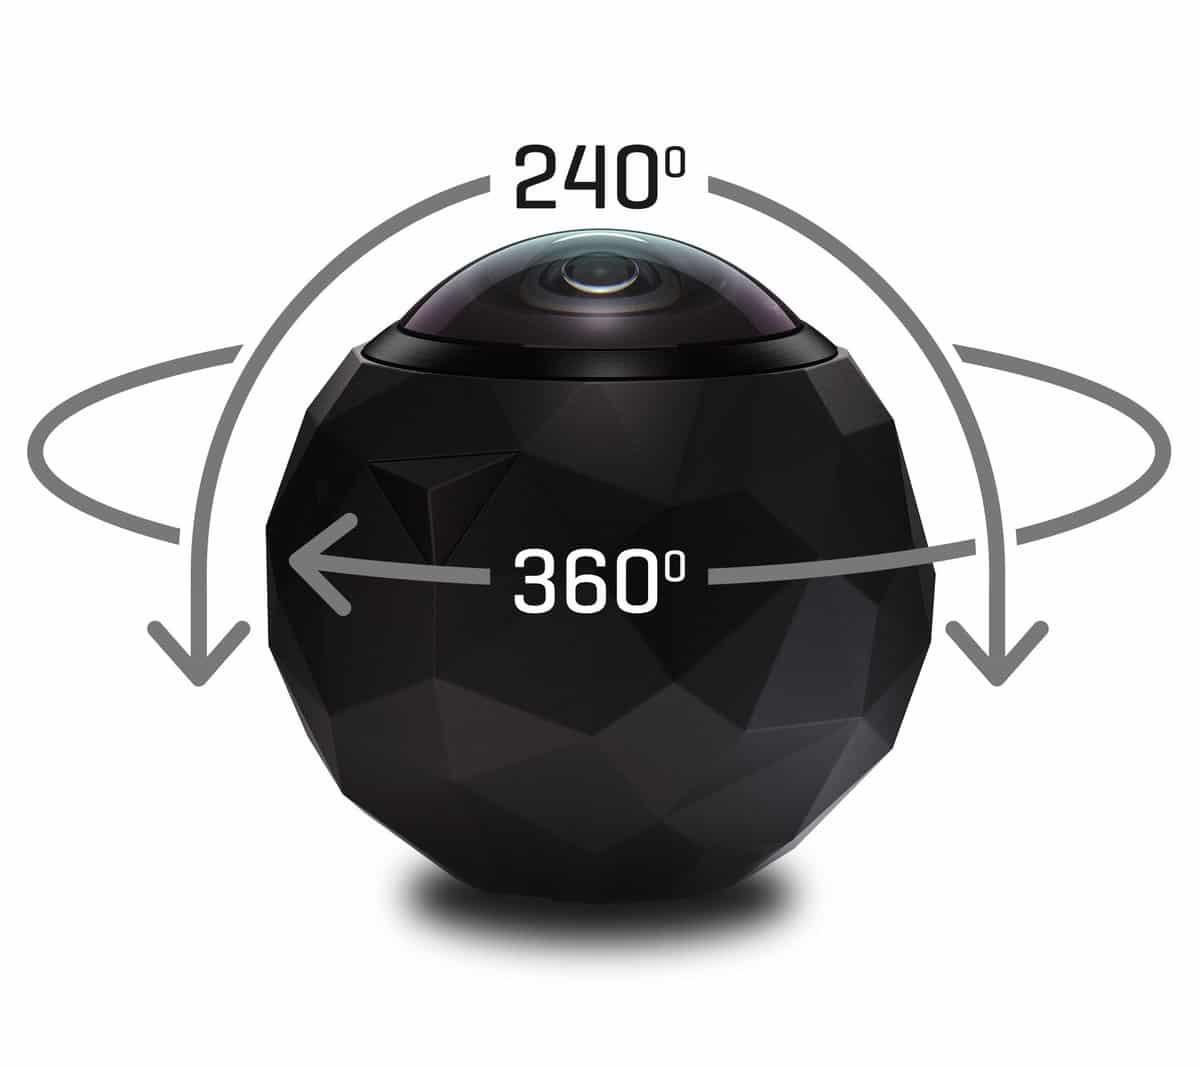 Goedkoopste 360fly Review